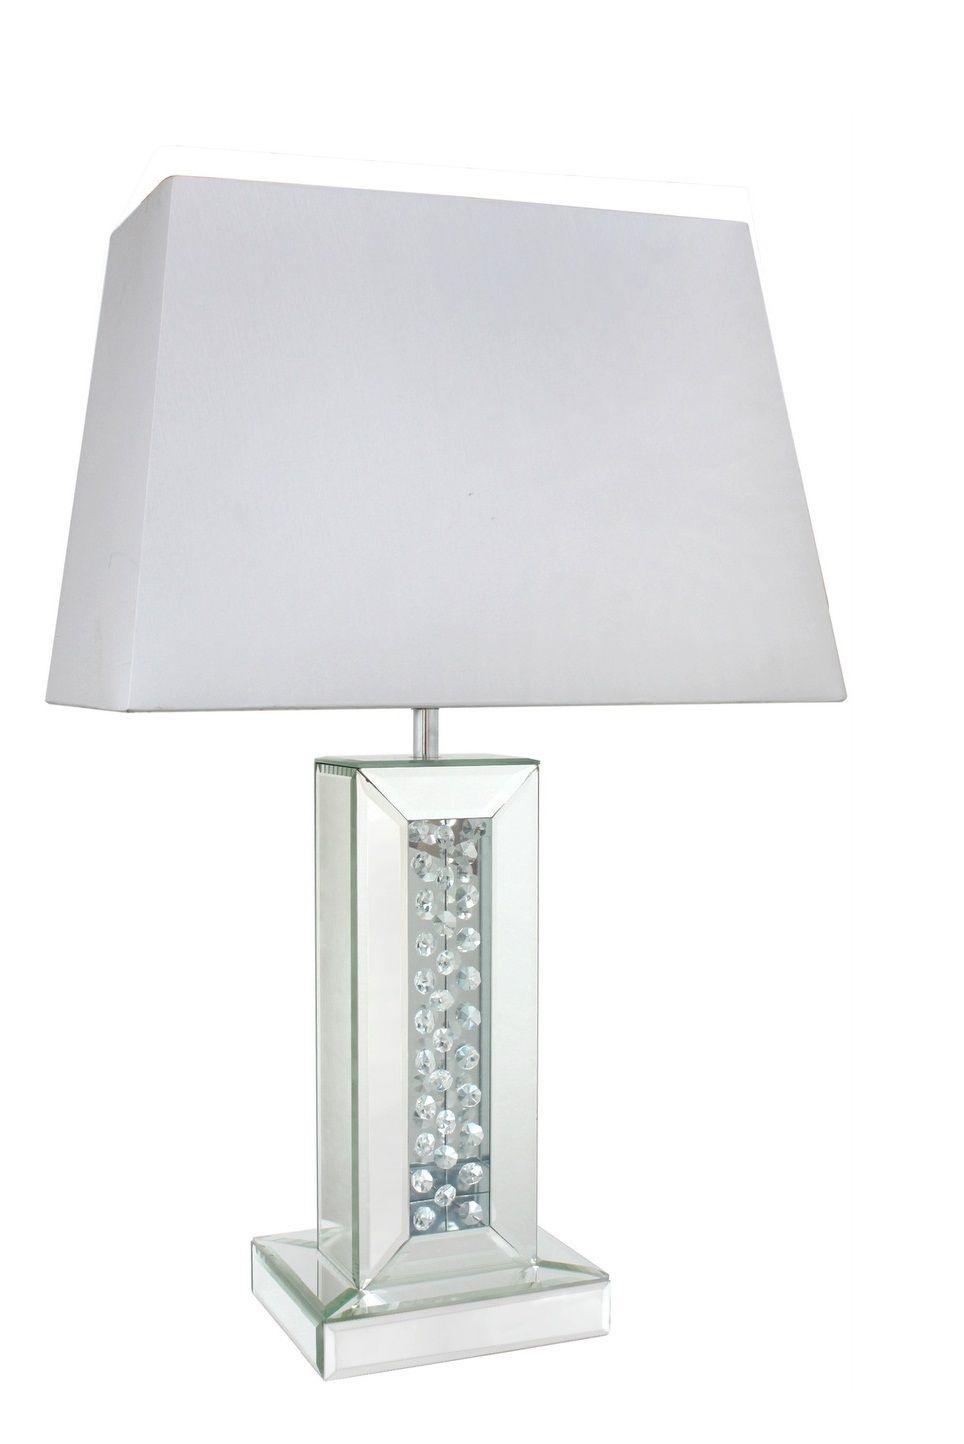 mirror-table-lamp-photo-16